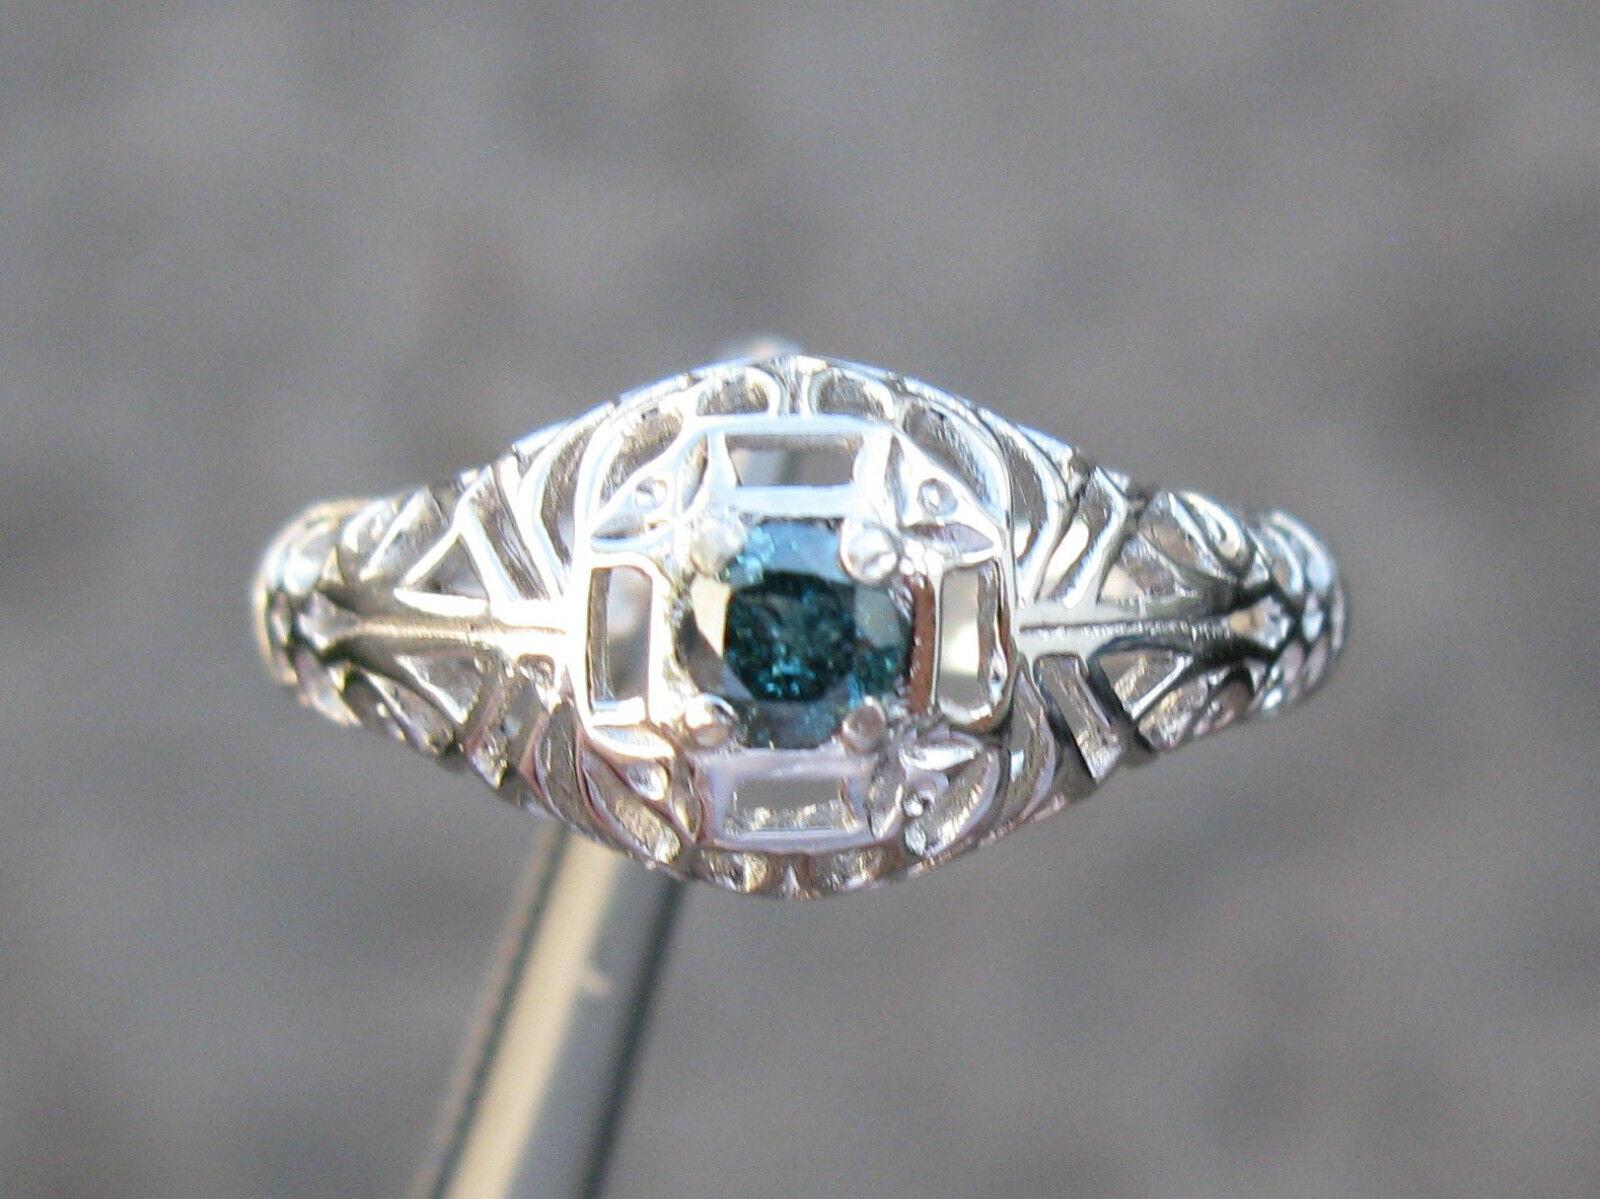 .20ct NATURAL blueeeE DIAMOND RING w  HAND CARVED FILIGREE ART DECO DETAILS Sz 6.75